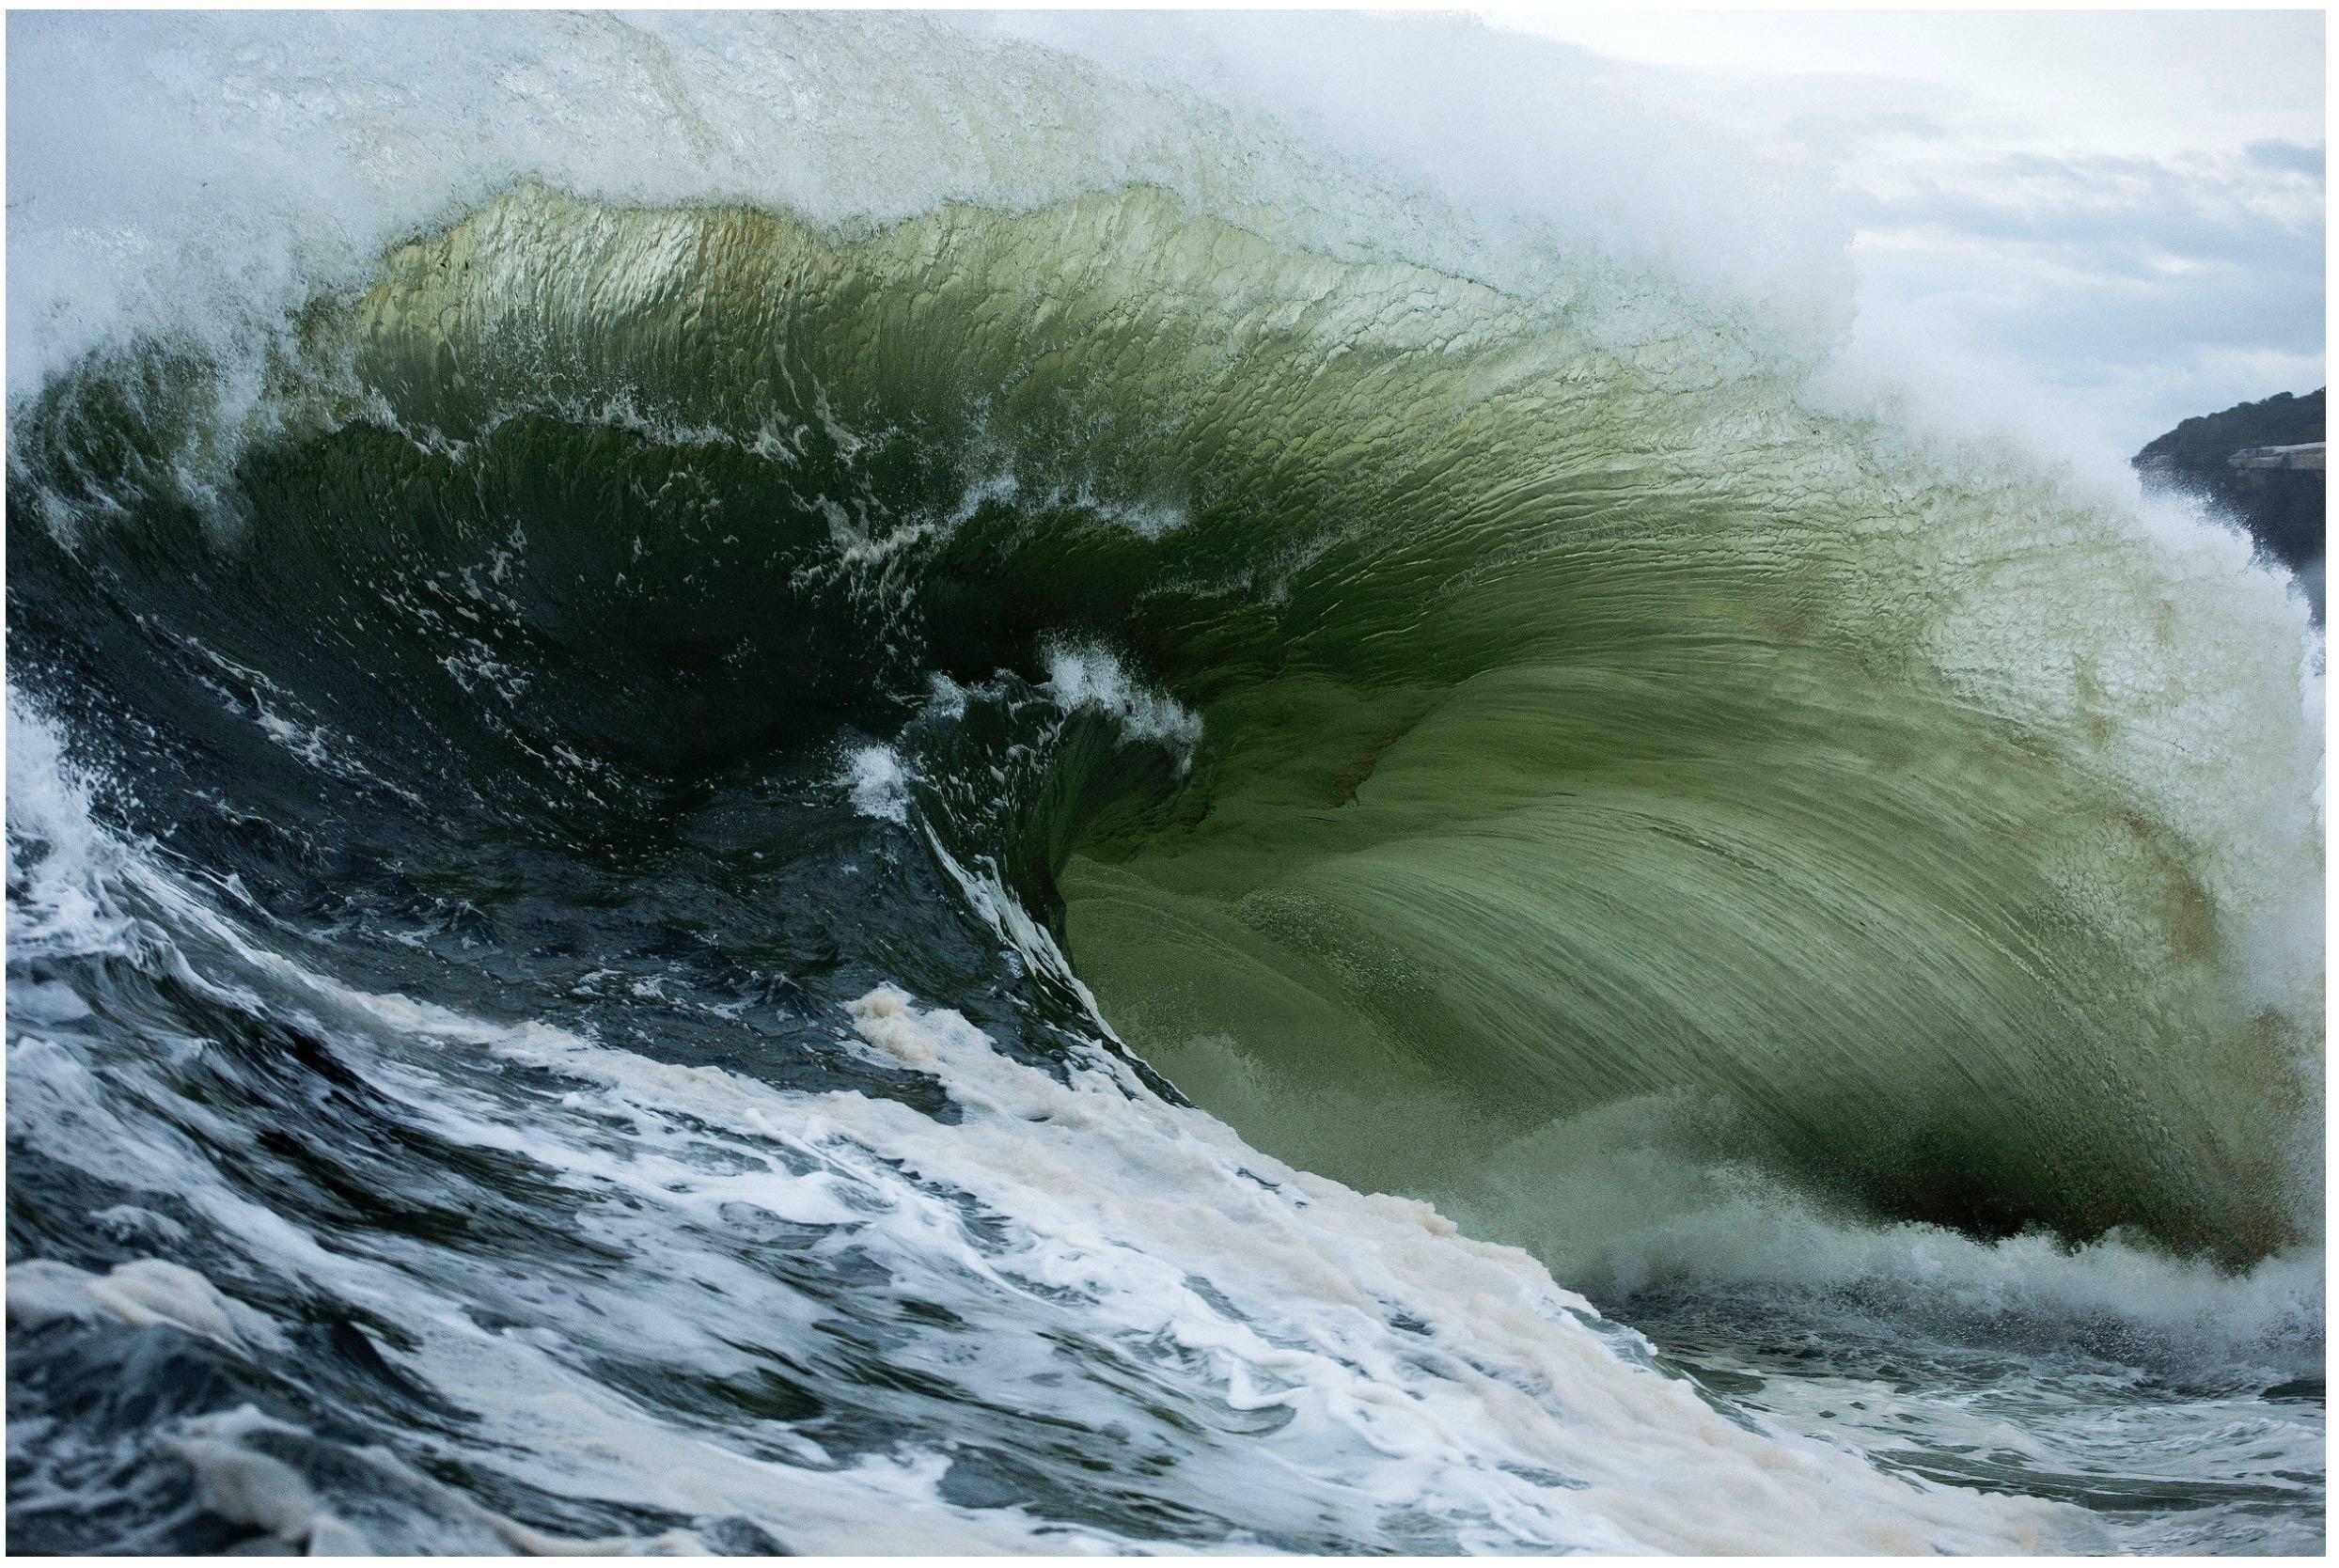 rodd-owen-ocean-surf-photography-for-sale-117.jpg